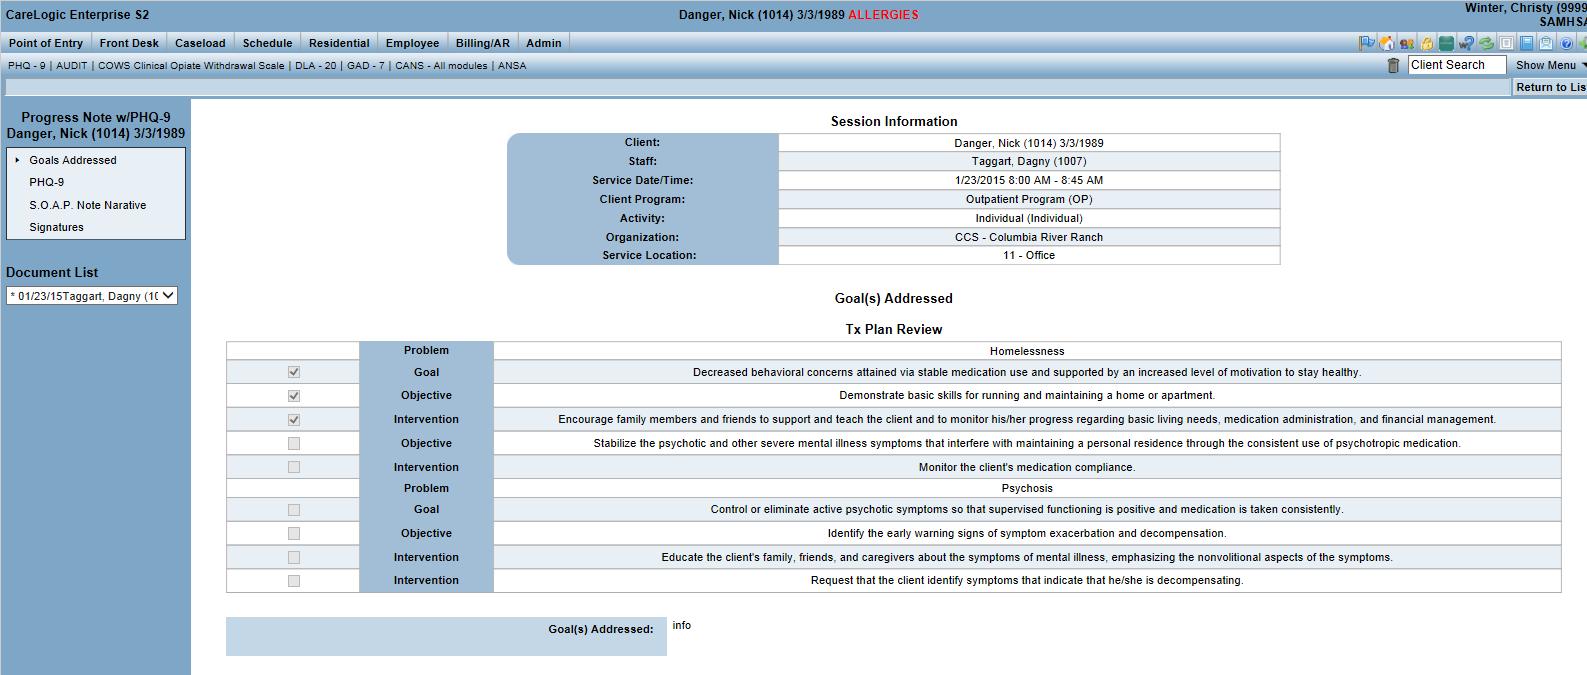 Qualifacts CareLogic Enterprise - Complete Progress Notes